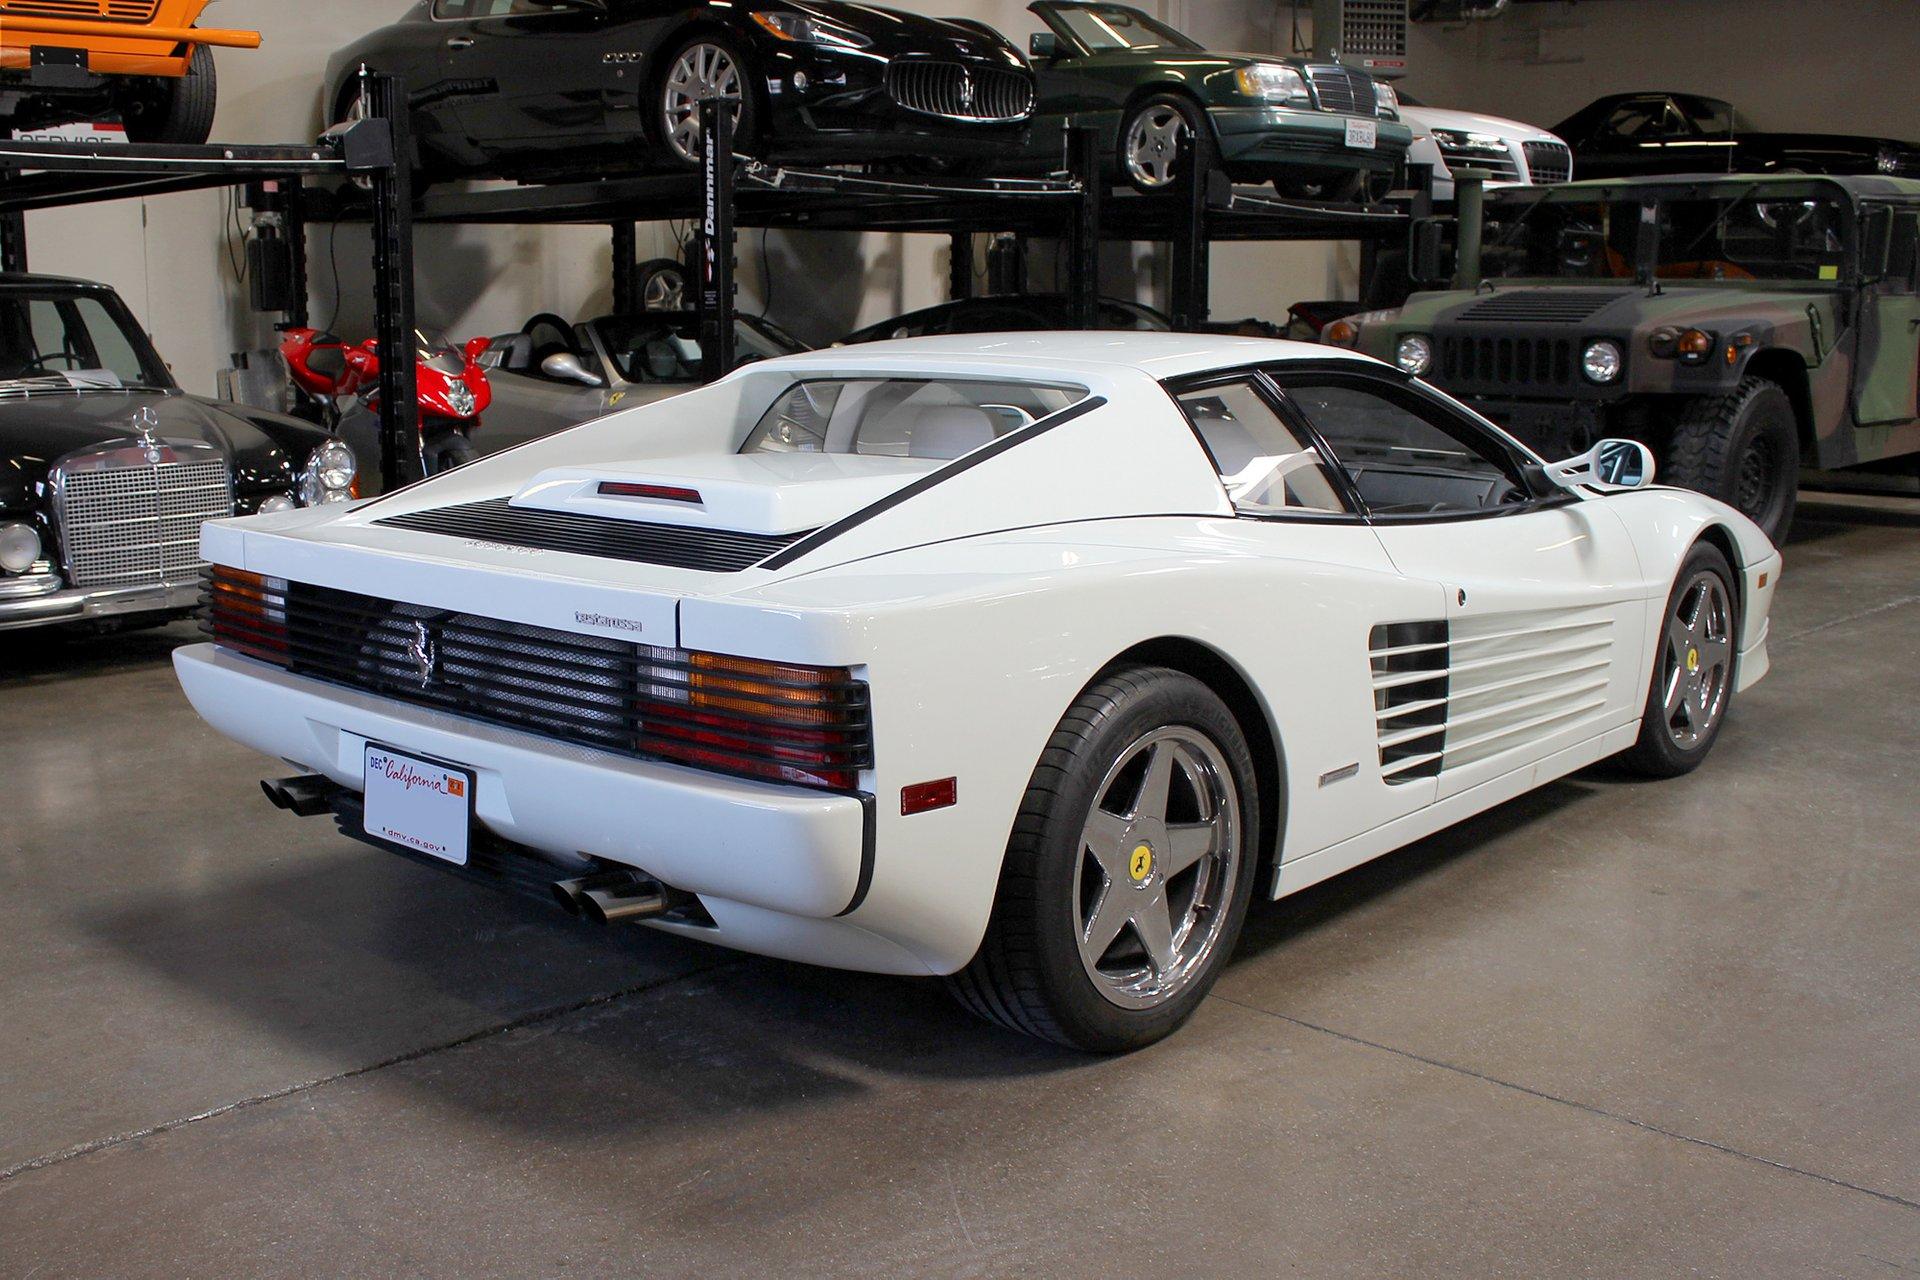 1988 Ferrari Testarossa For Sale 117016 Mcg